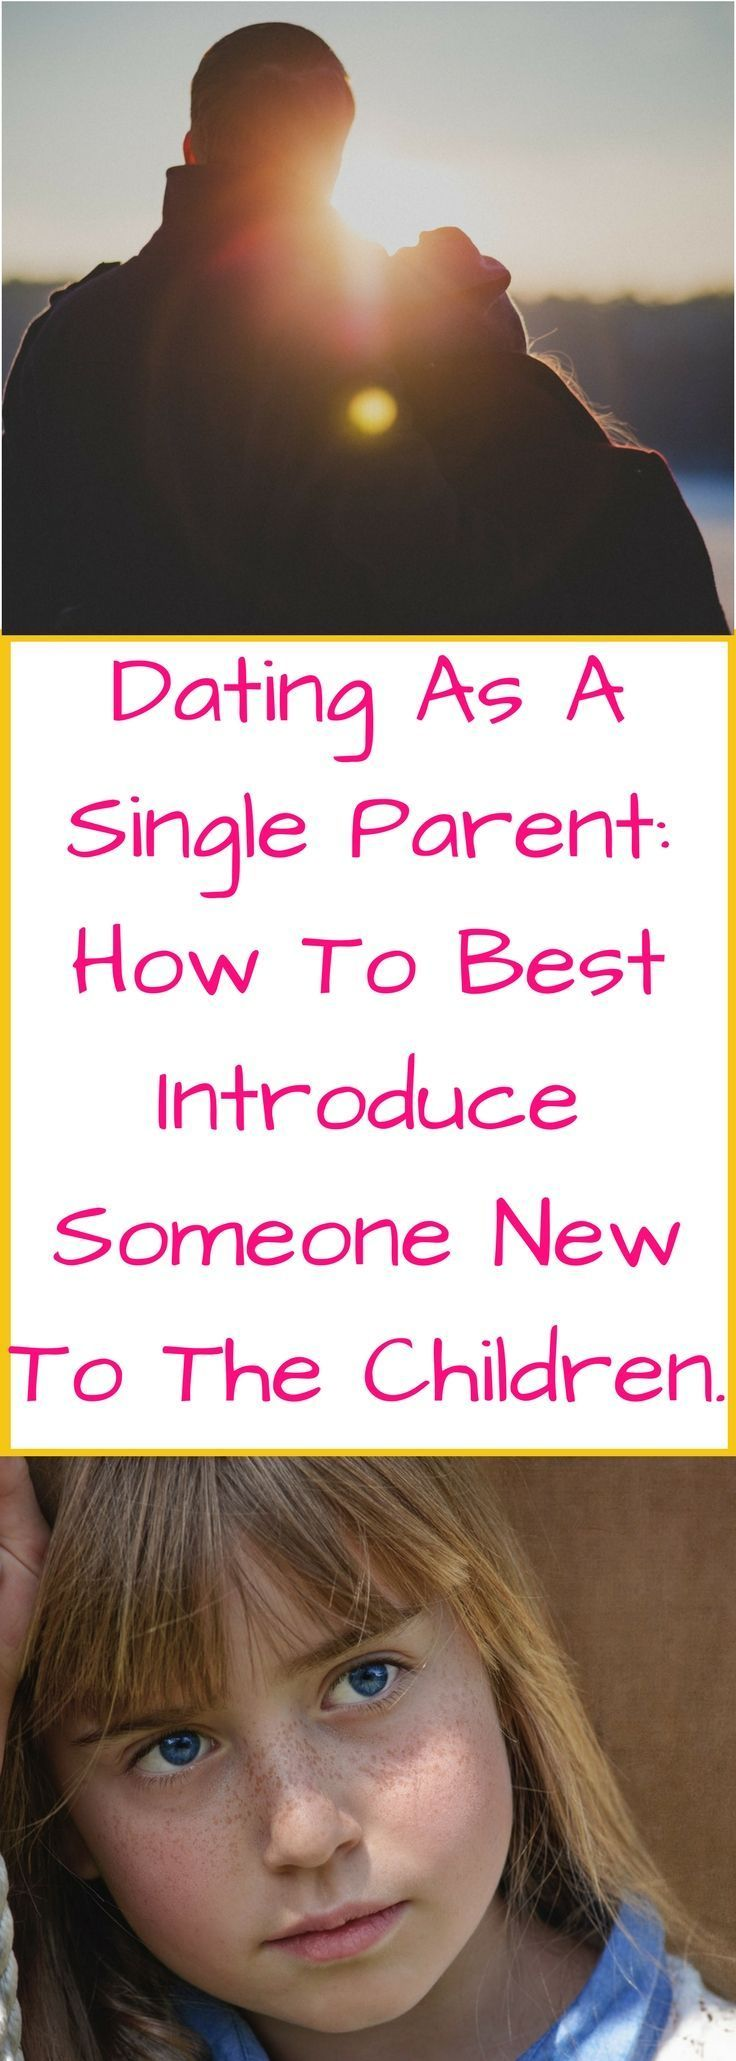 Best single parent dating advice